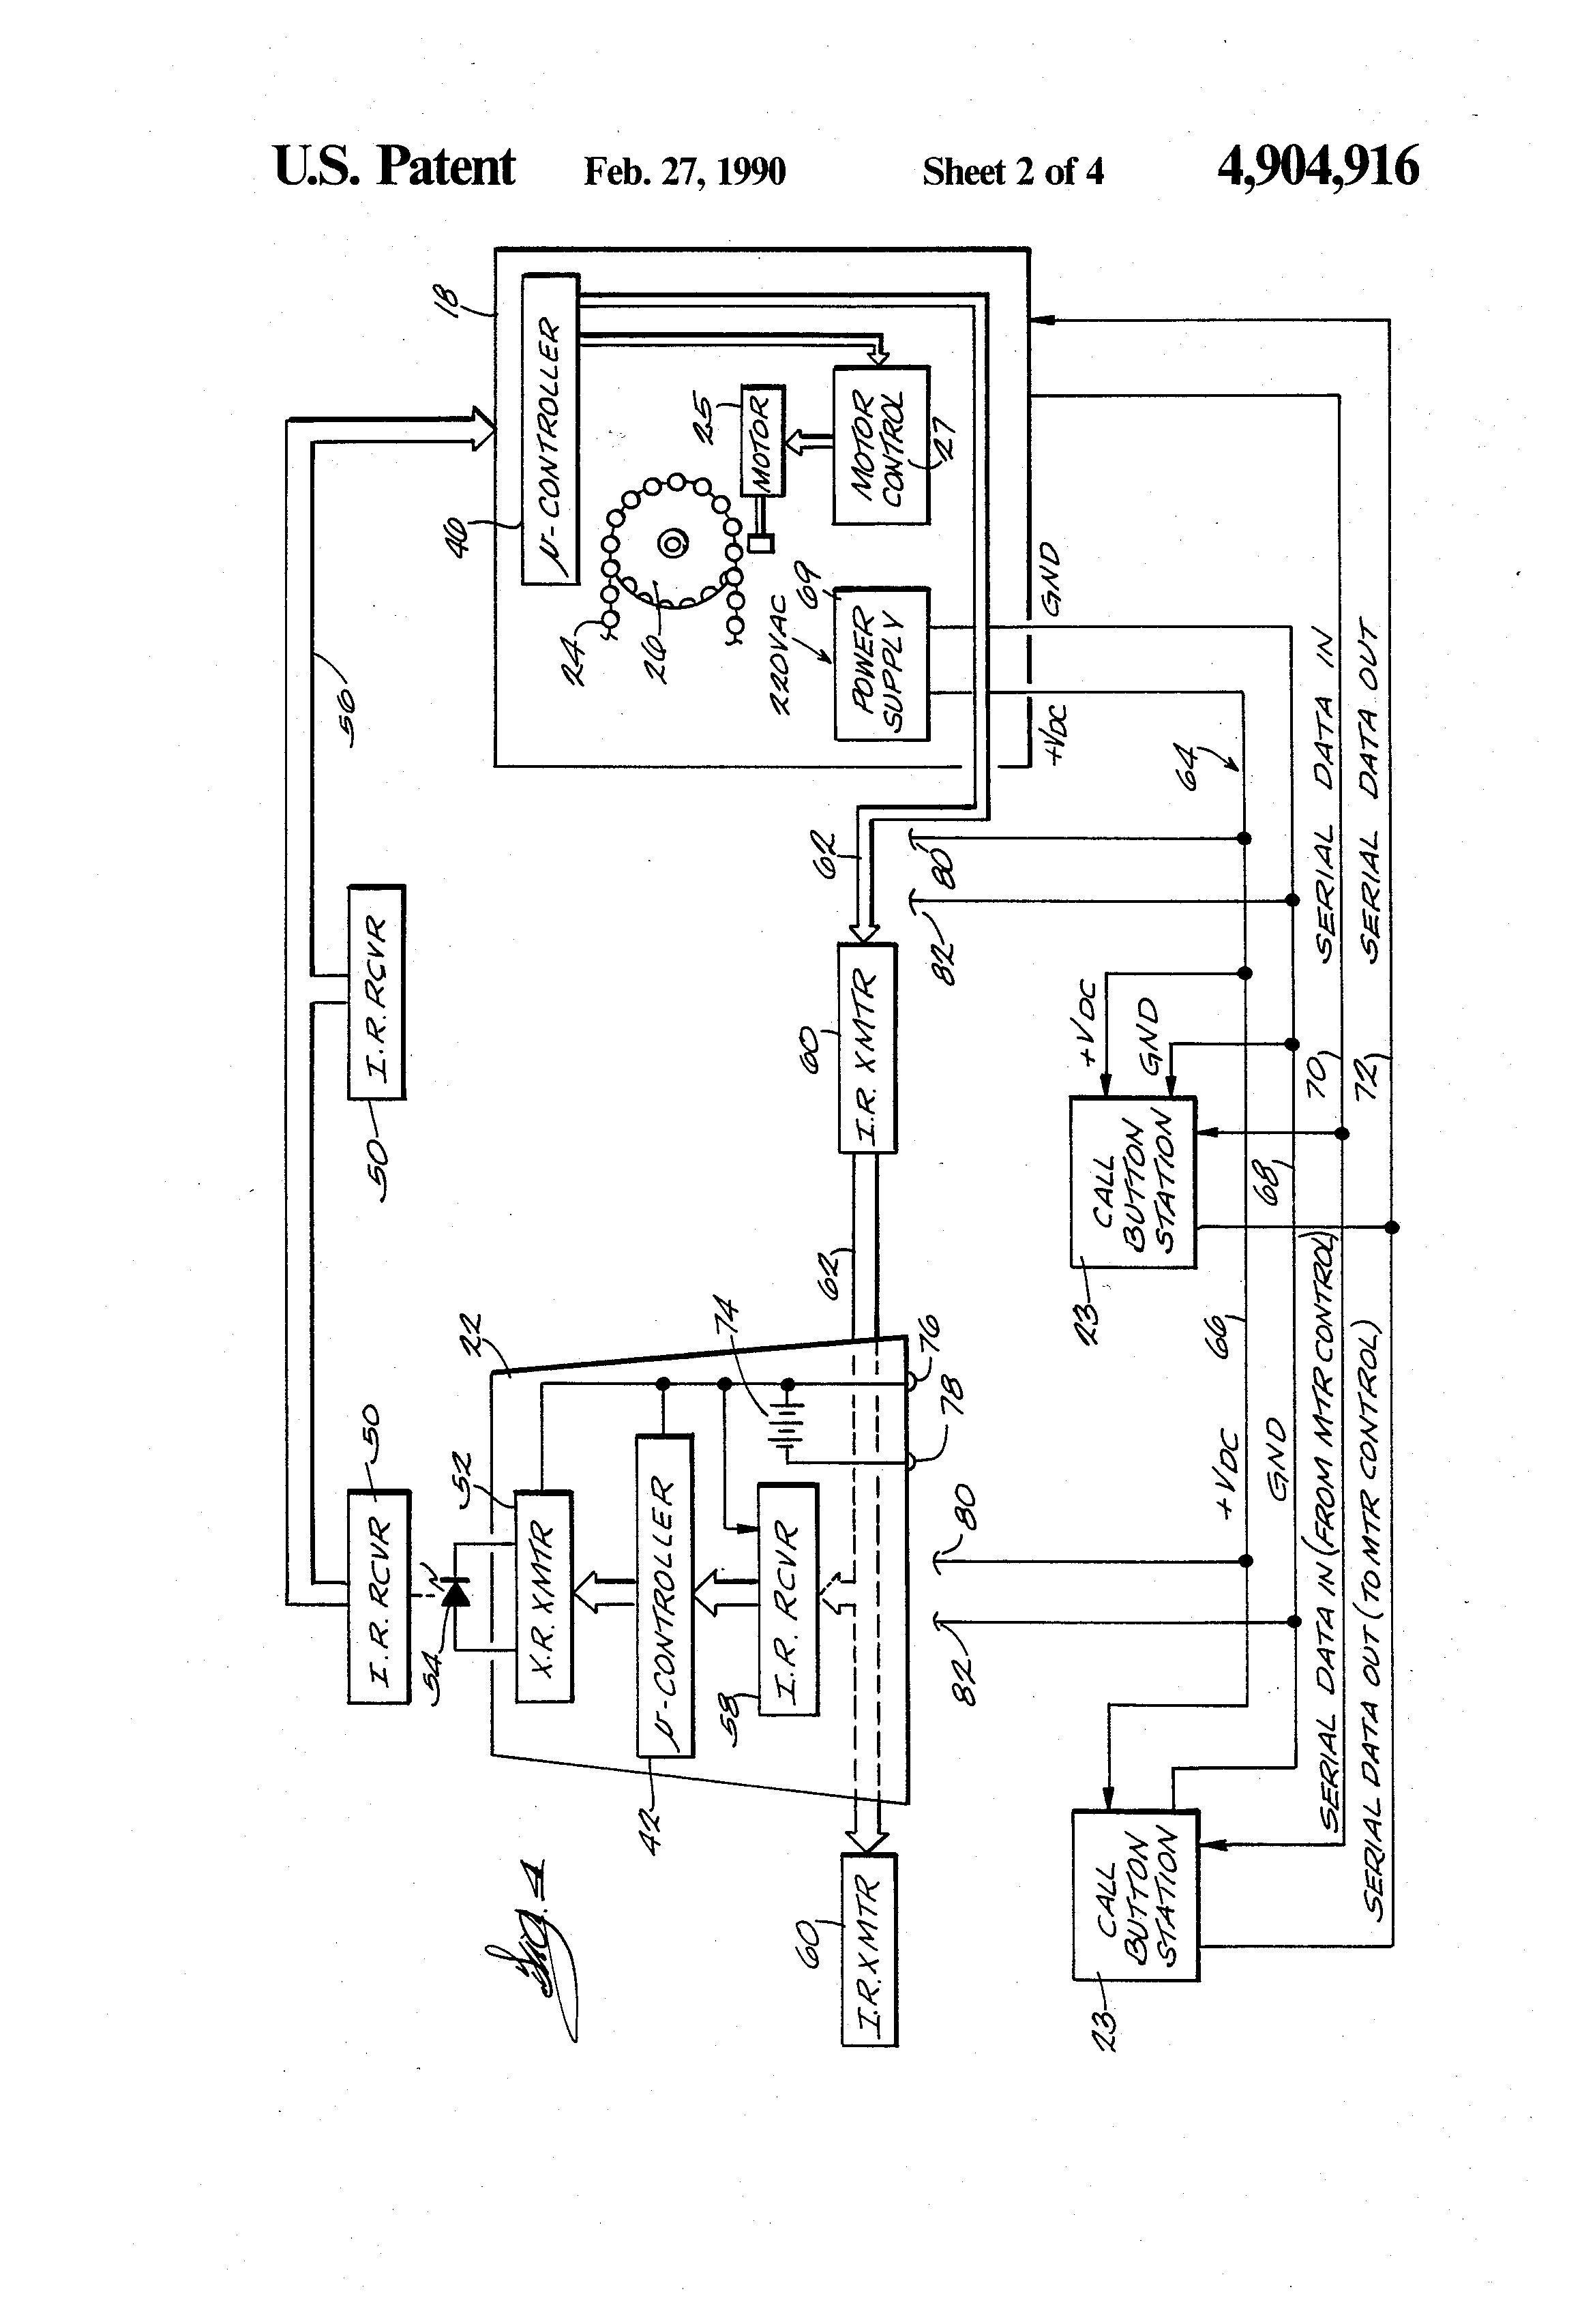 Jlg Scissor Lift Wiring Diagram In 2021 Electrical Diagram Wiring Diagram Diagram